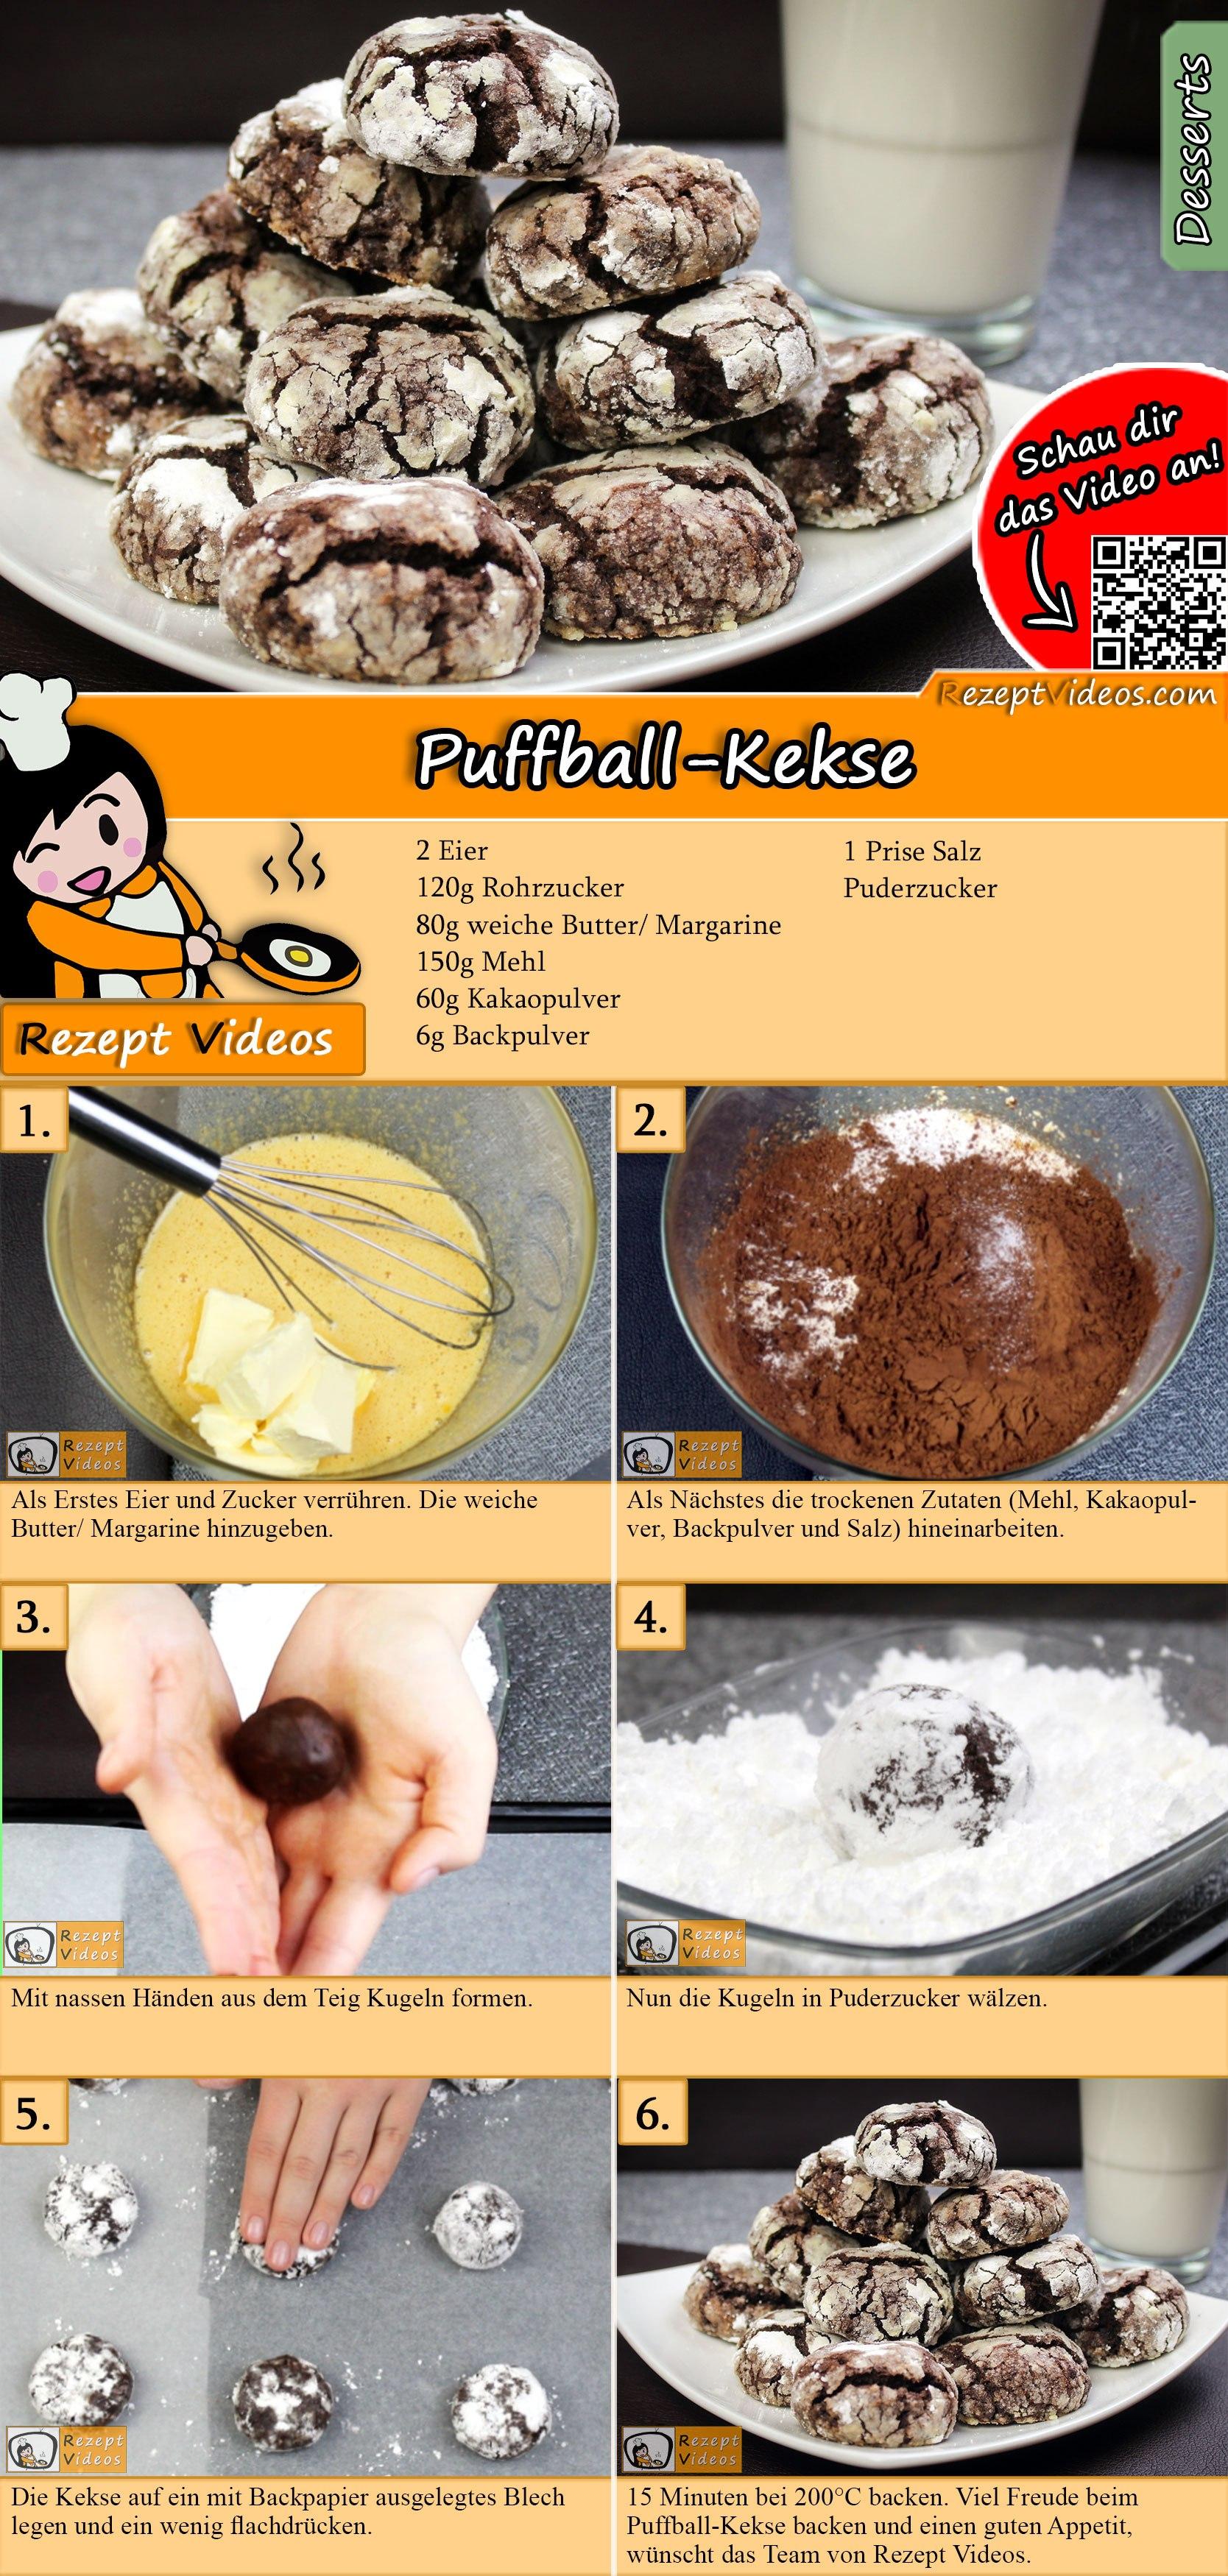 Puffball-Kekse Rezept mit Video